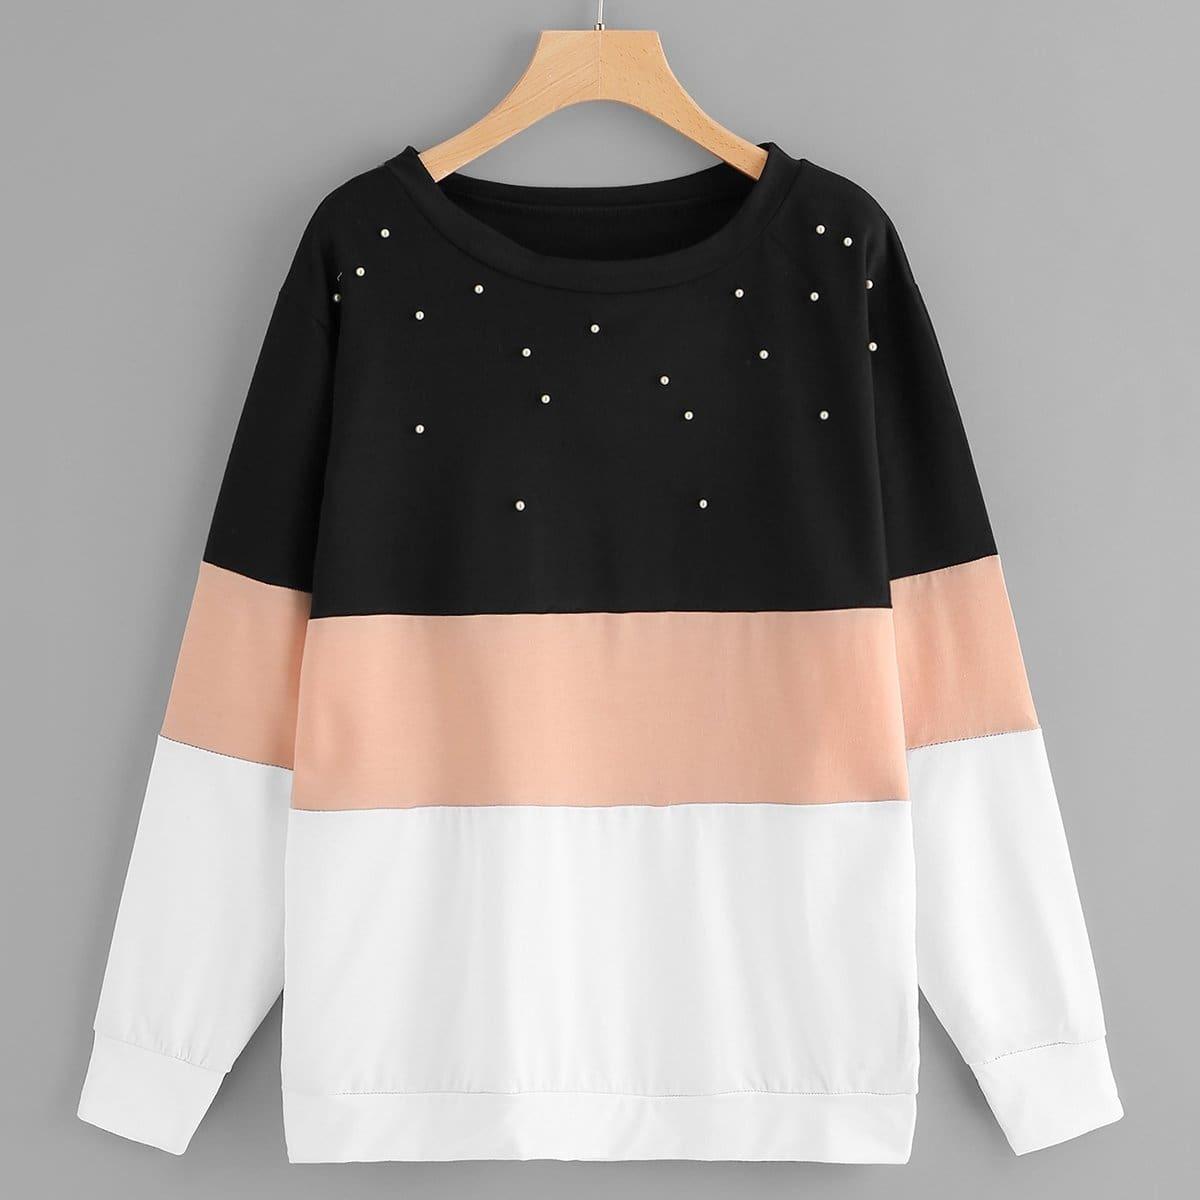 Kleurblok sweatshirt met parels